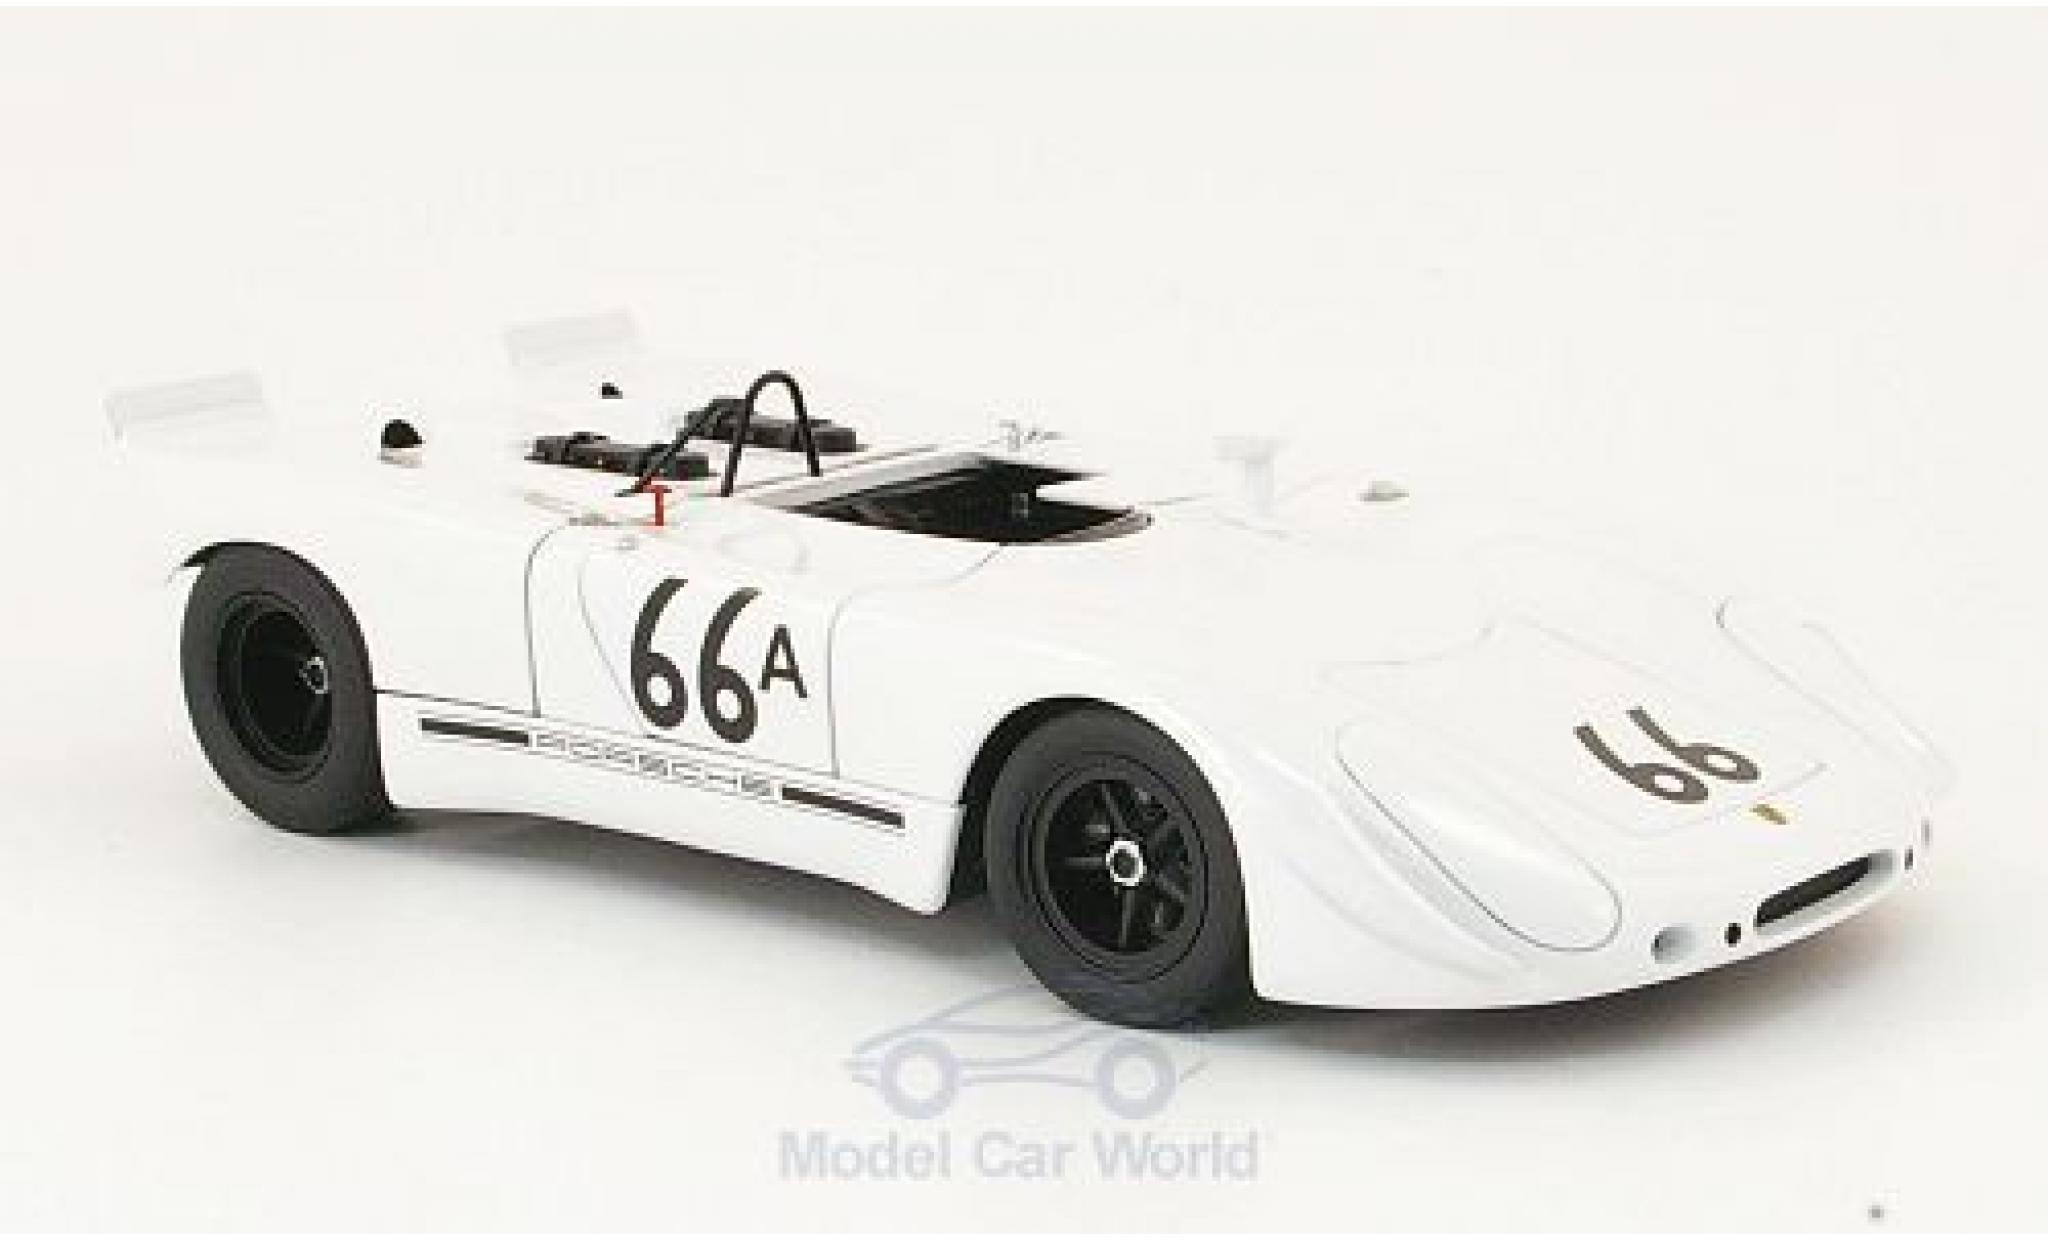 Porsche 908 1970 1/18 AUTOart /2 No.66A S.McQueen Holtville